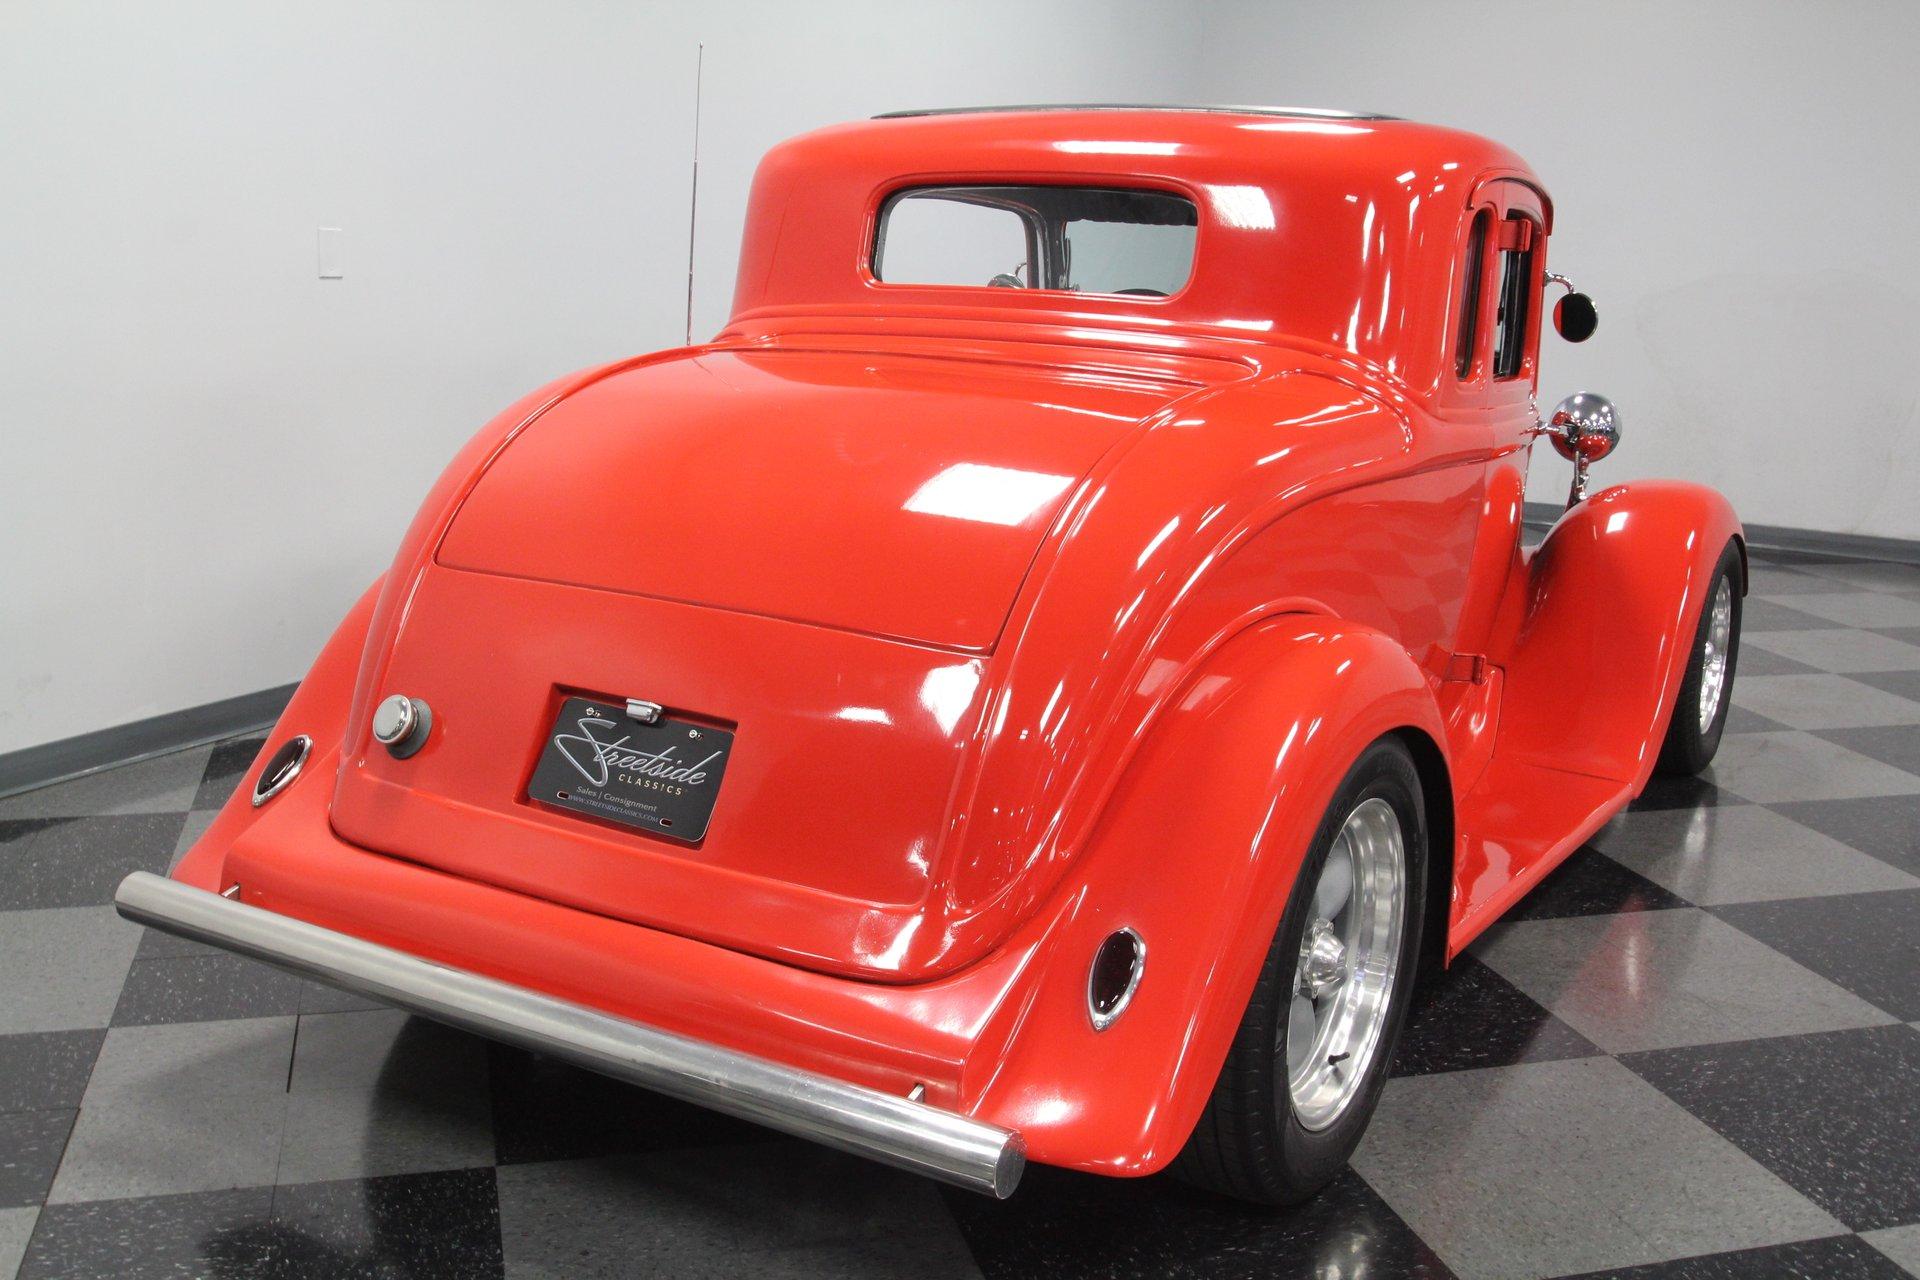 Sensational 1933 Plymouth 5 Window Coupe For Sale 103992 Mcg Spiritservingveterans Wood Chair Design Ideas Spiritservingveteransorg